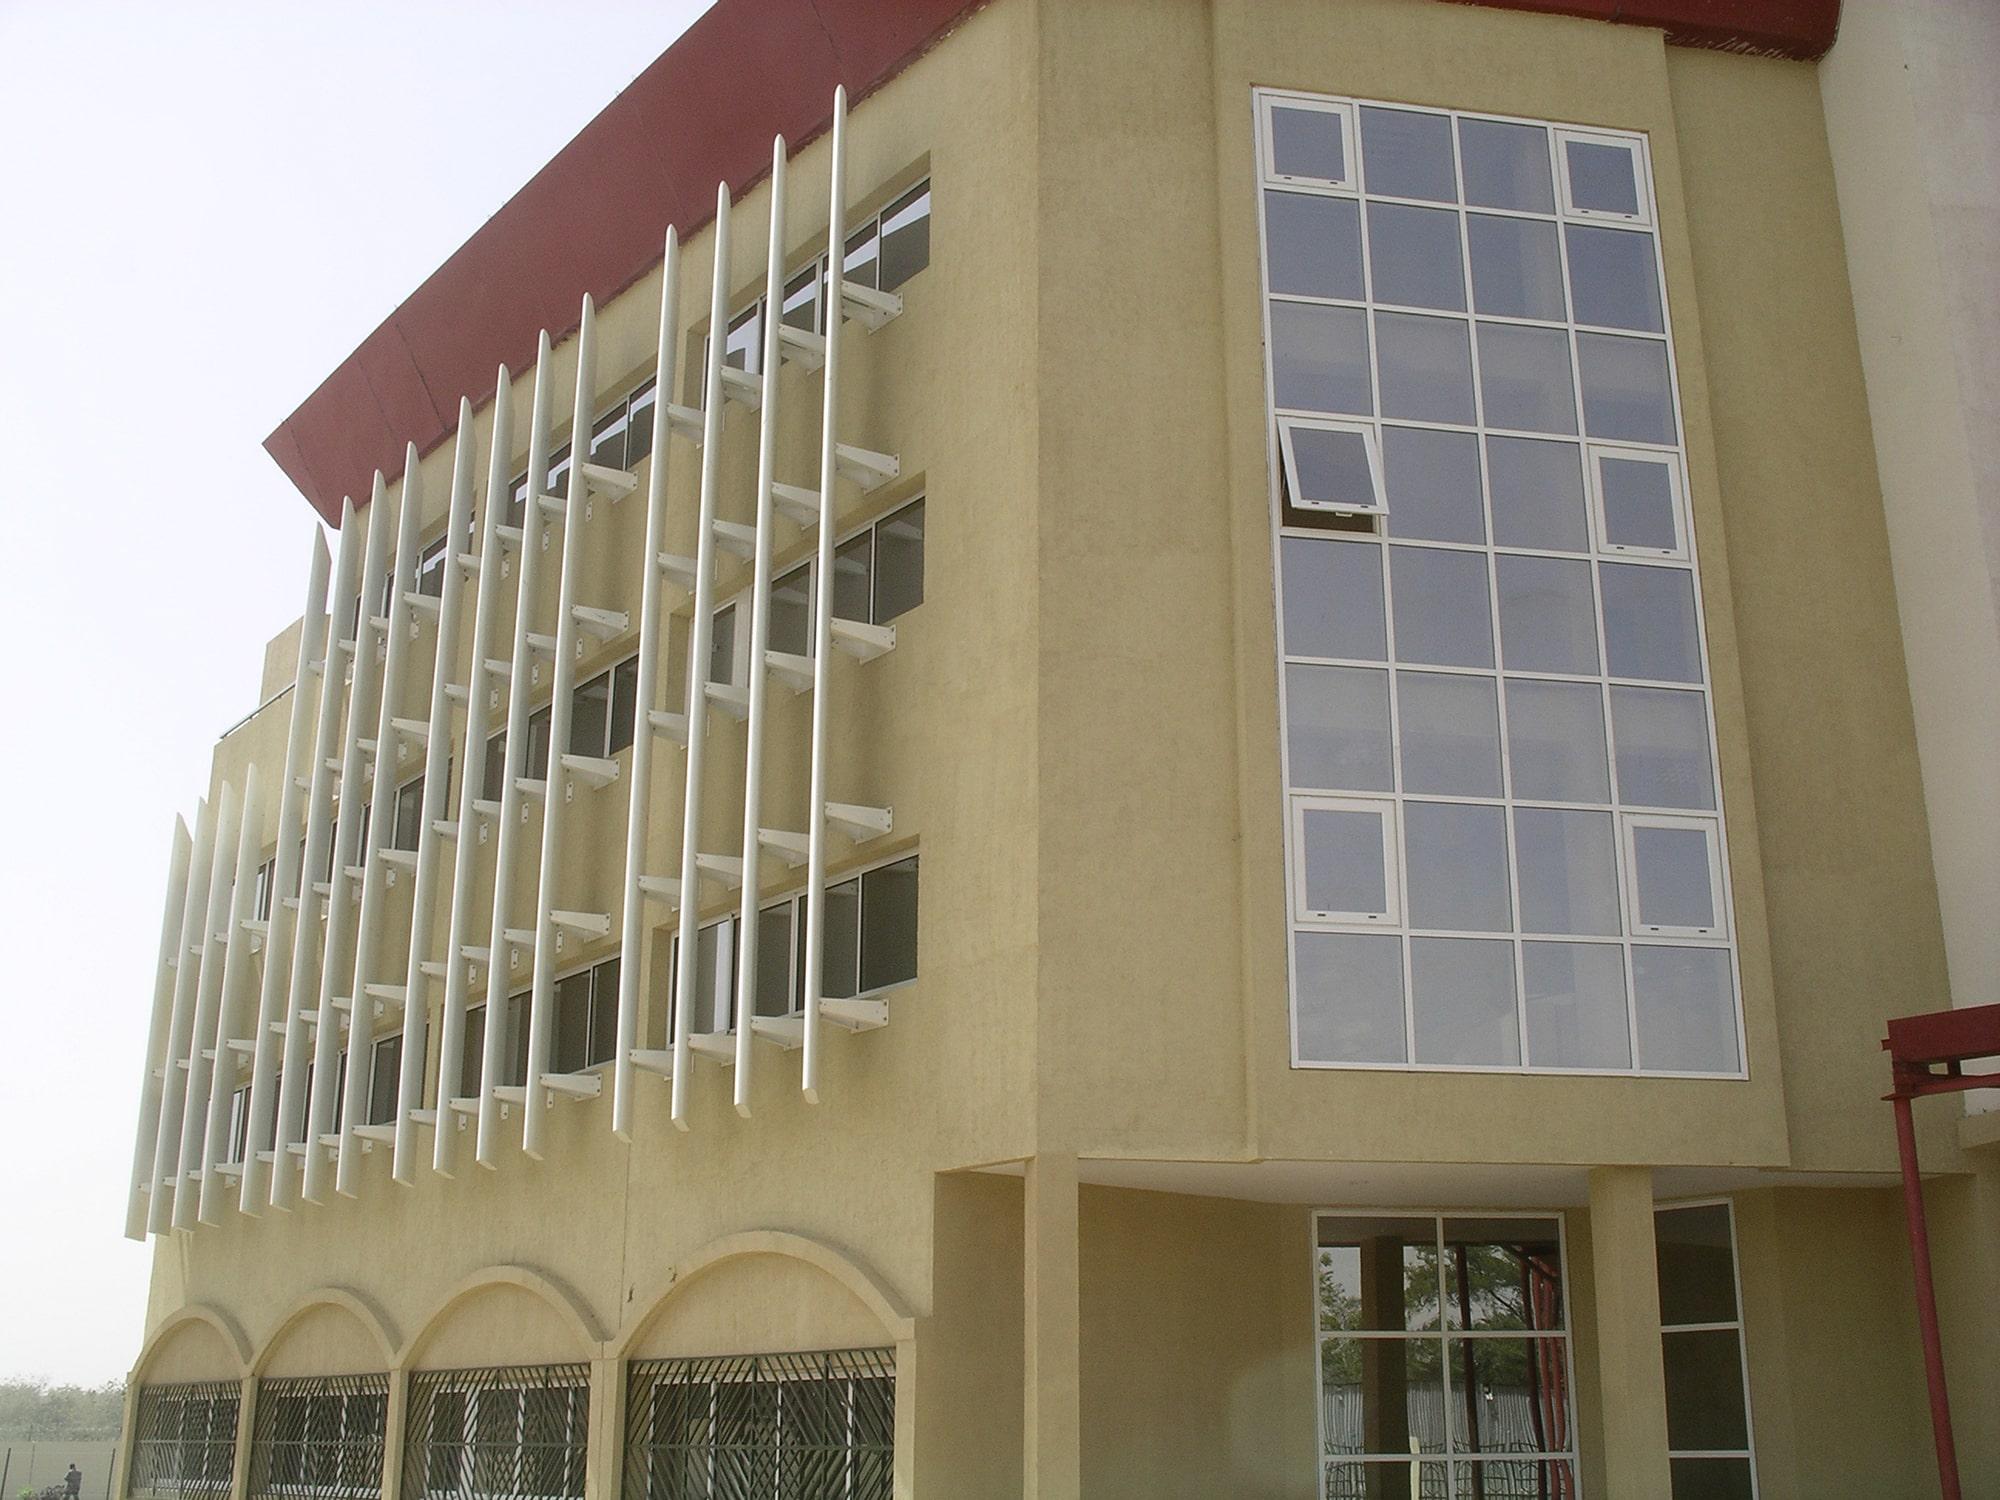 Siège De La Cebevirha N'djamena : Menuiseries Ext. AluBrise Soleil 5